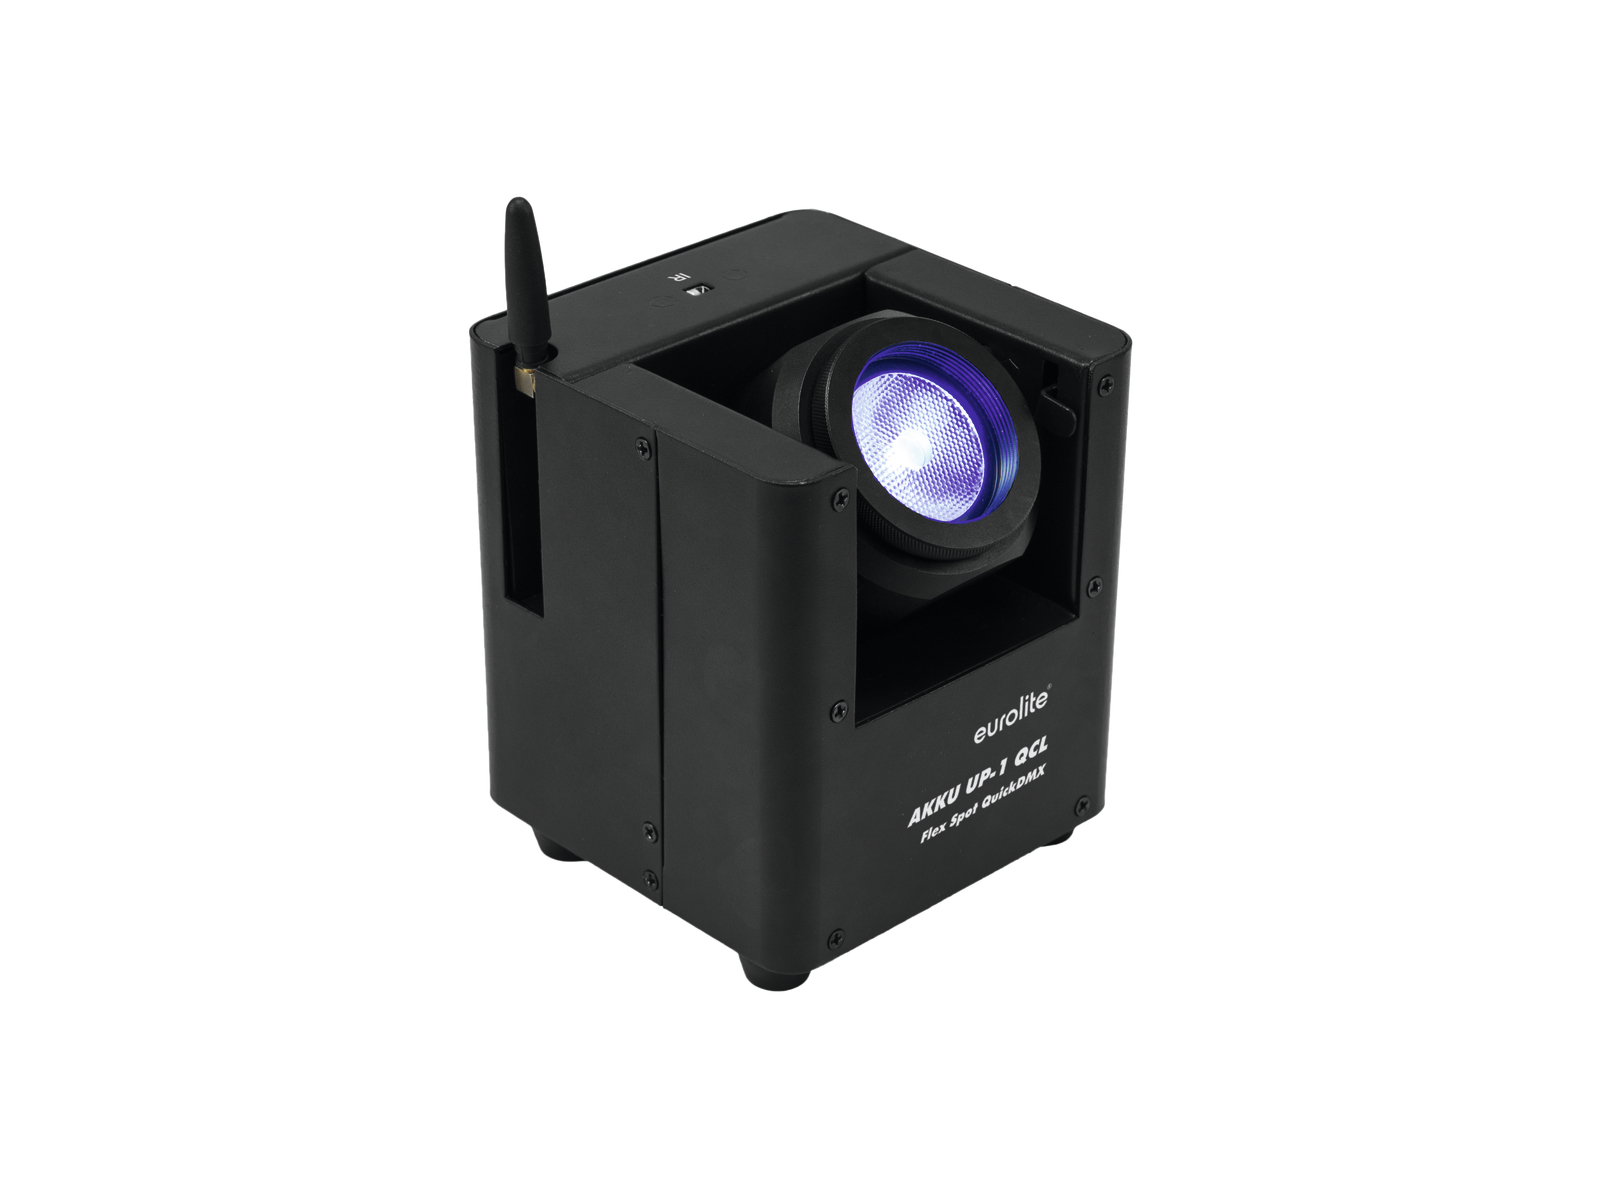 Eurolite LED hlavice AKKU 1x15W QCL QuickDMX, IR, dobíjecí baterie